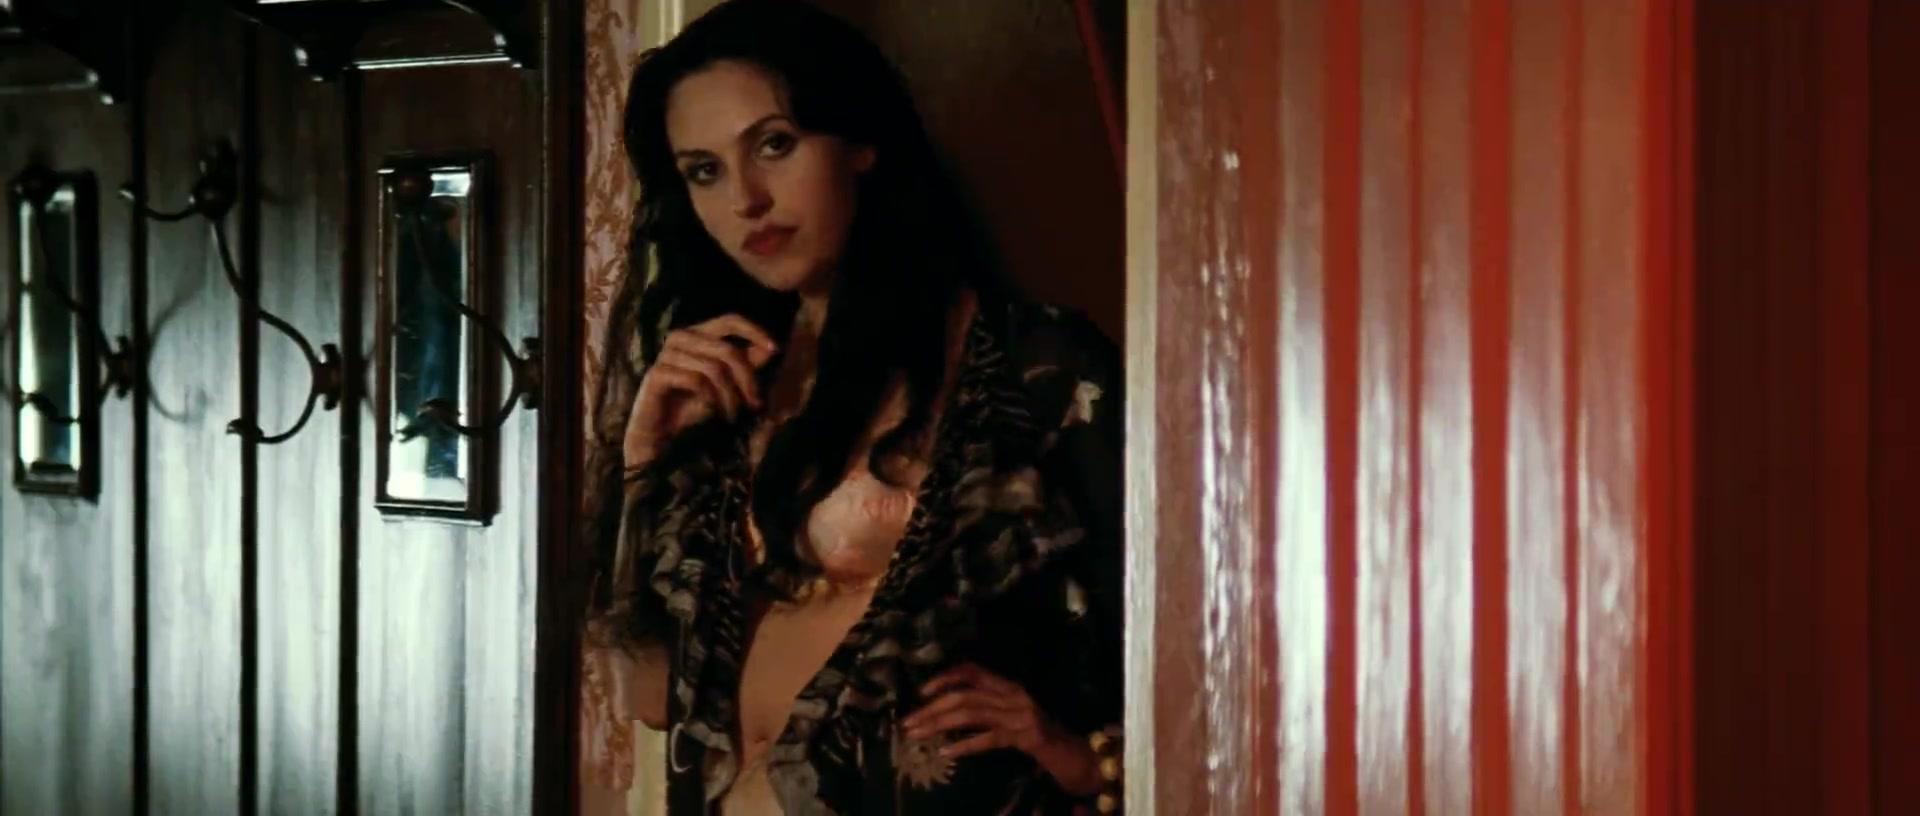 Monica Bellucci looks fantastic - Mal